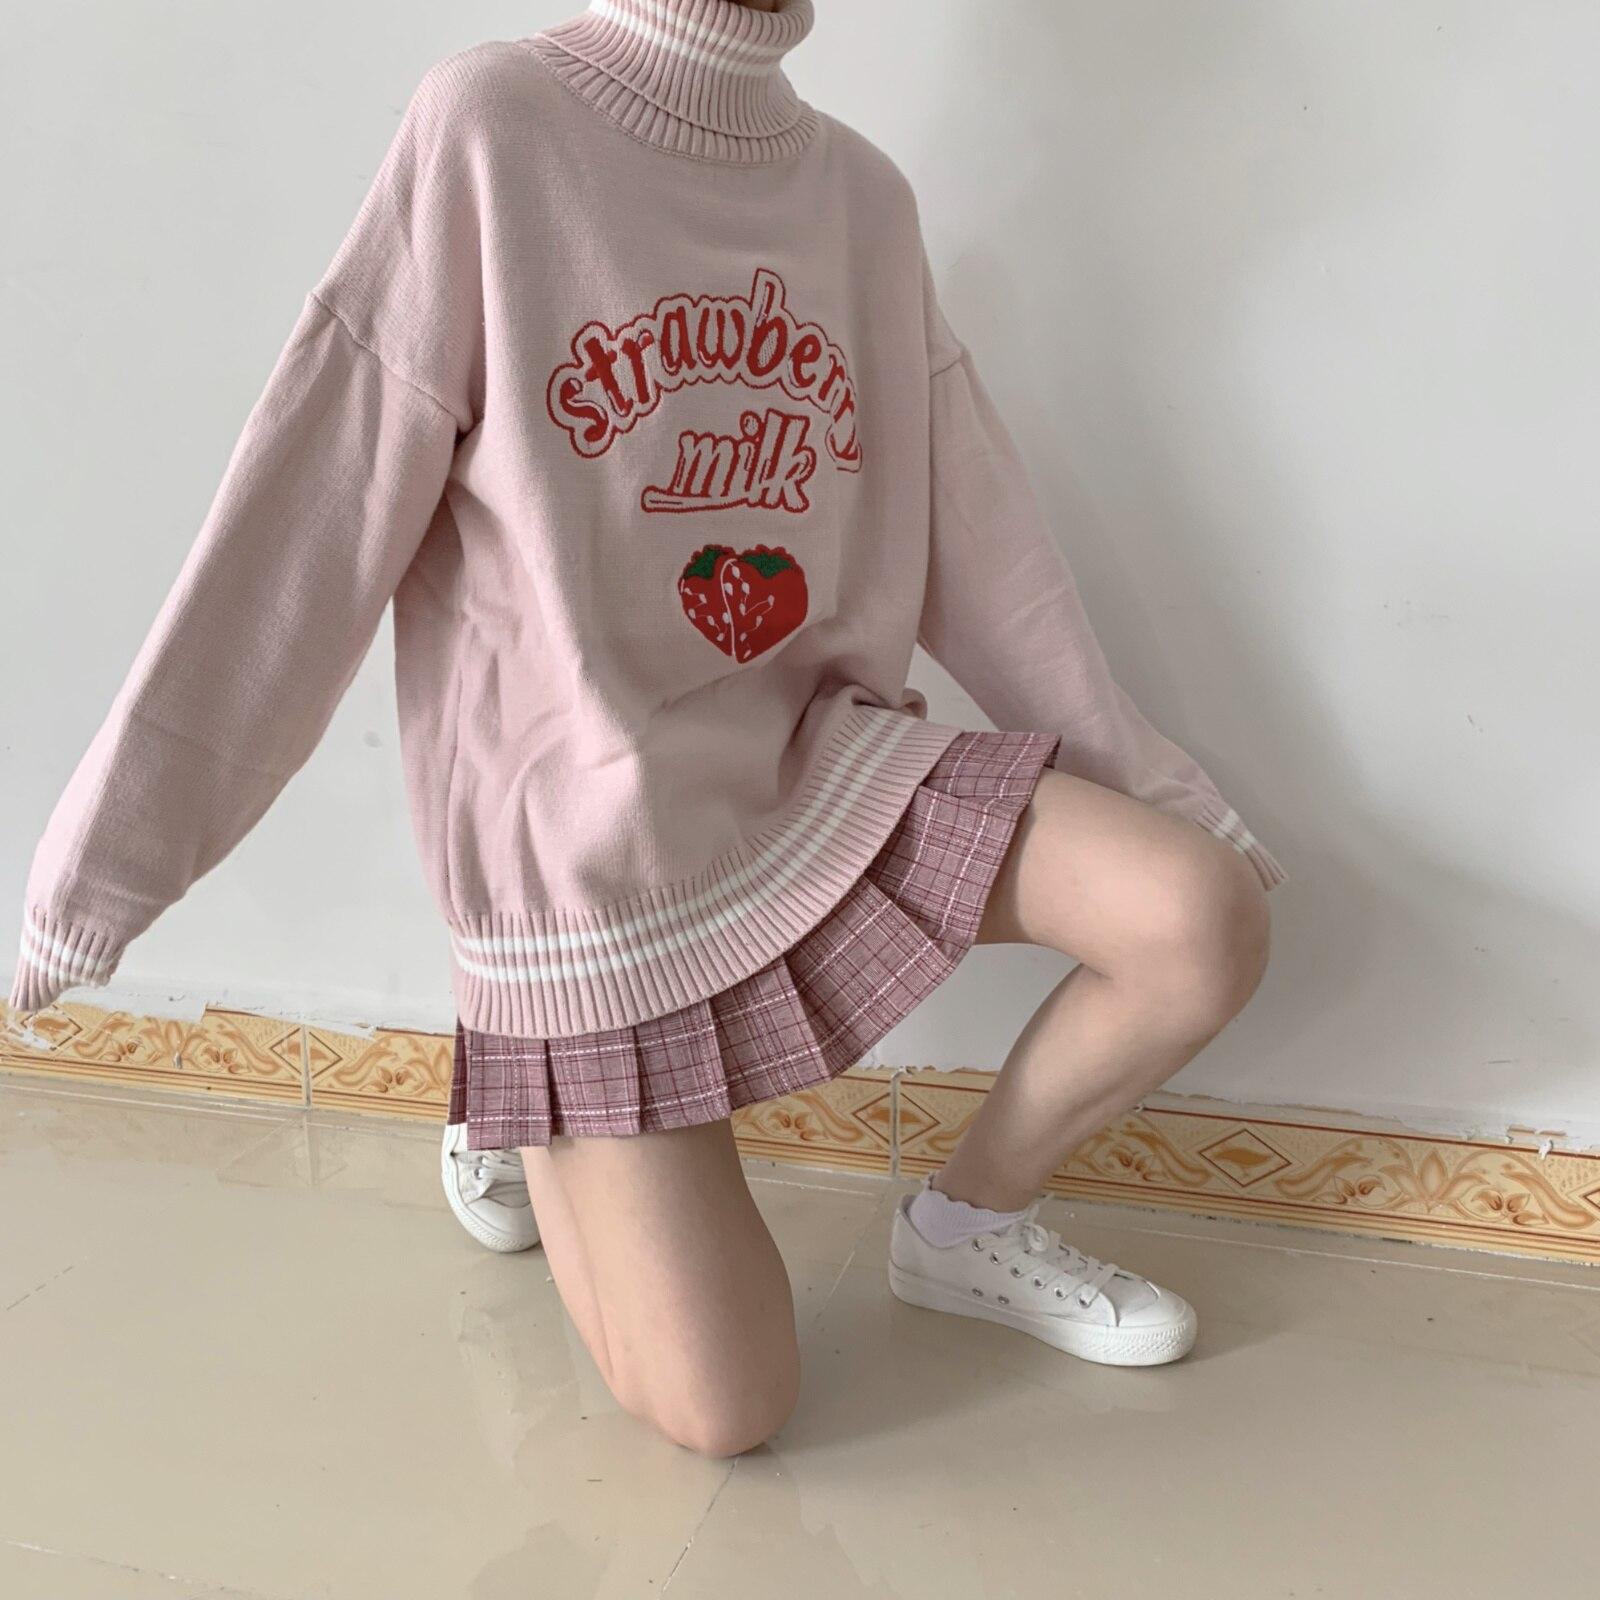 82e88dd38eb Japanese Women Vintage Sweater Turtleneck Cute Strawberry Milk ...